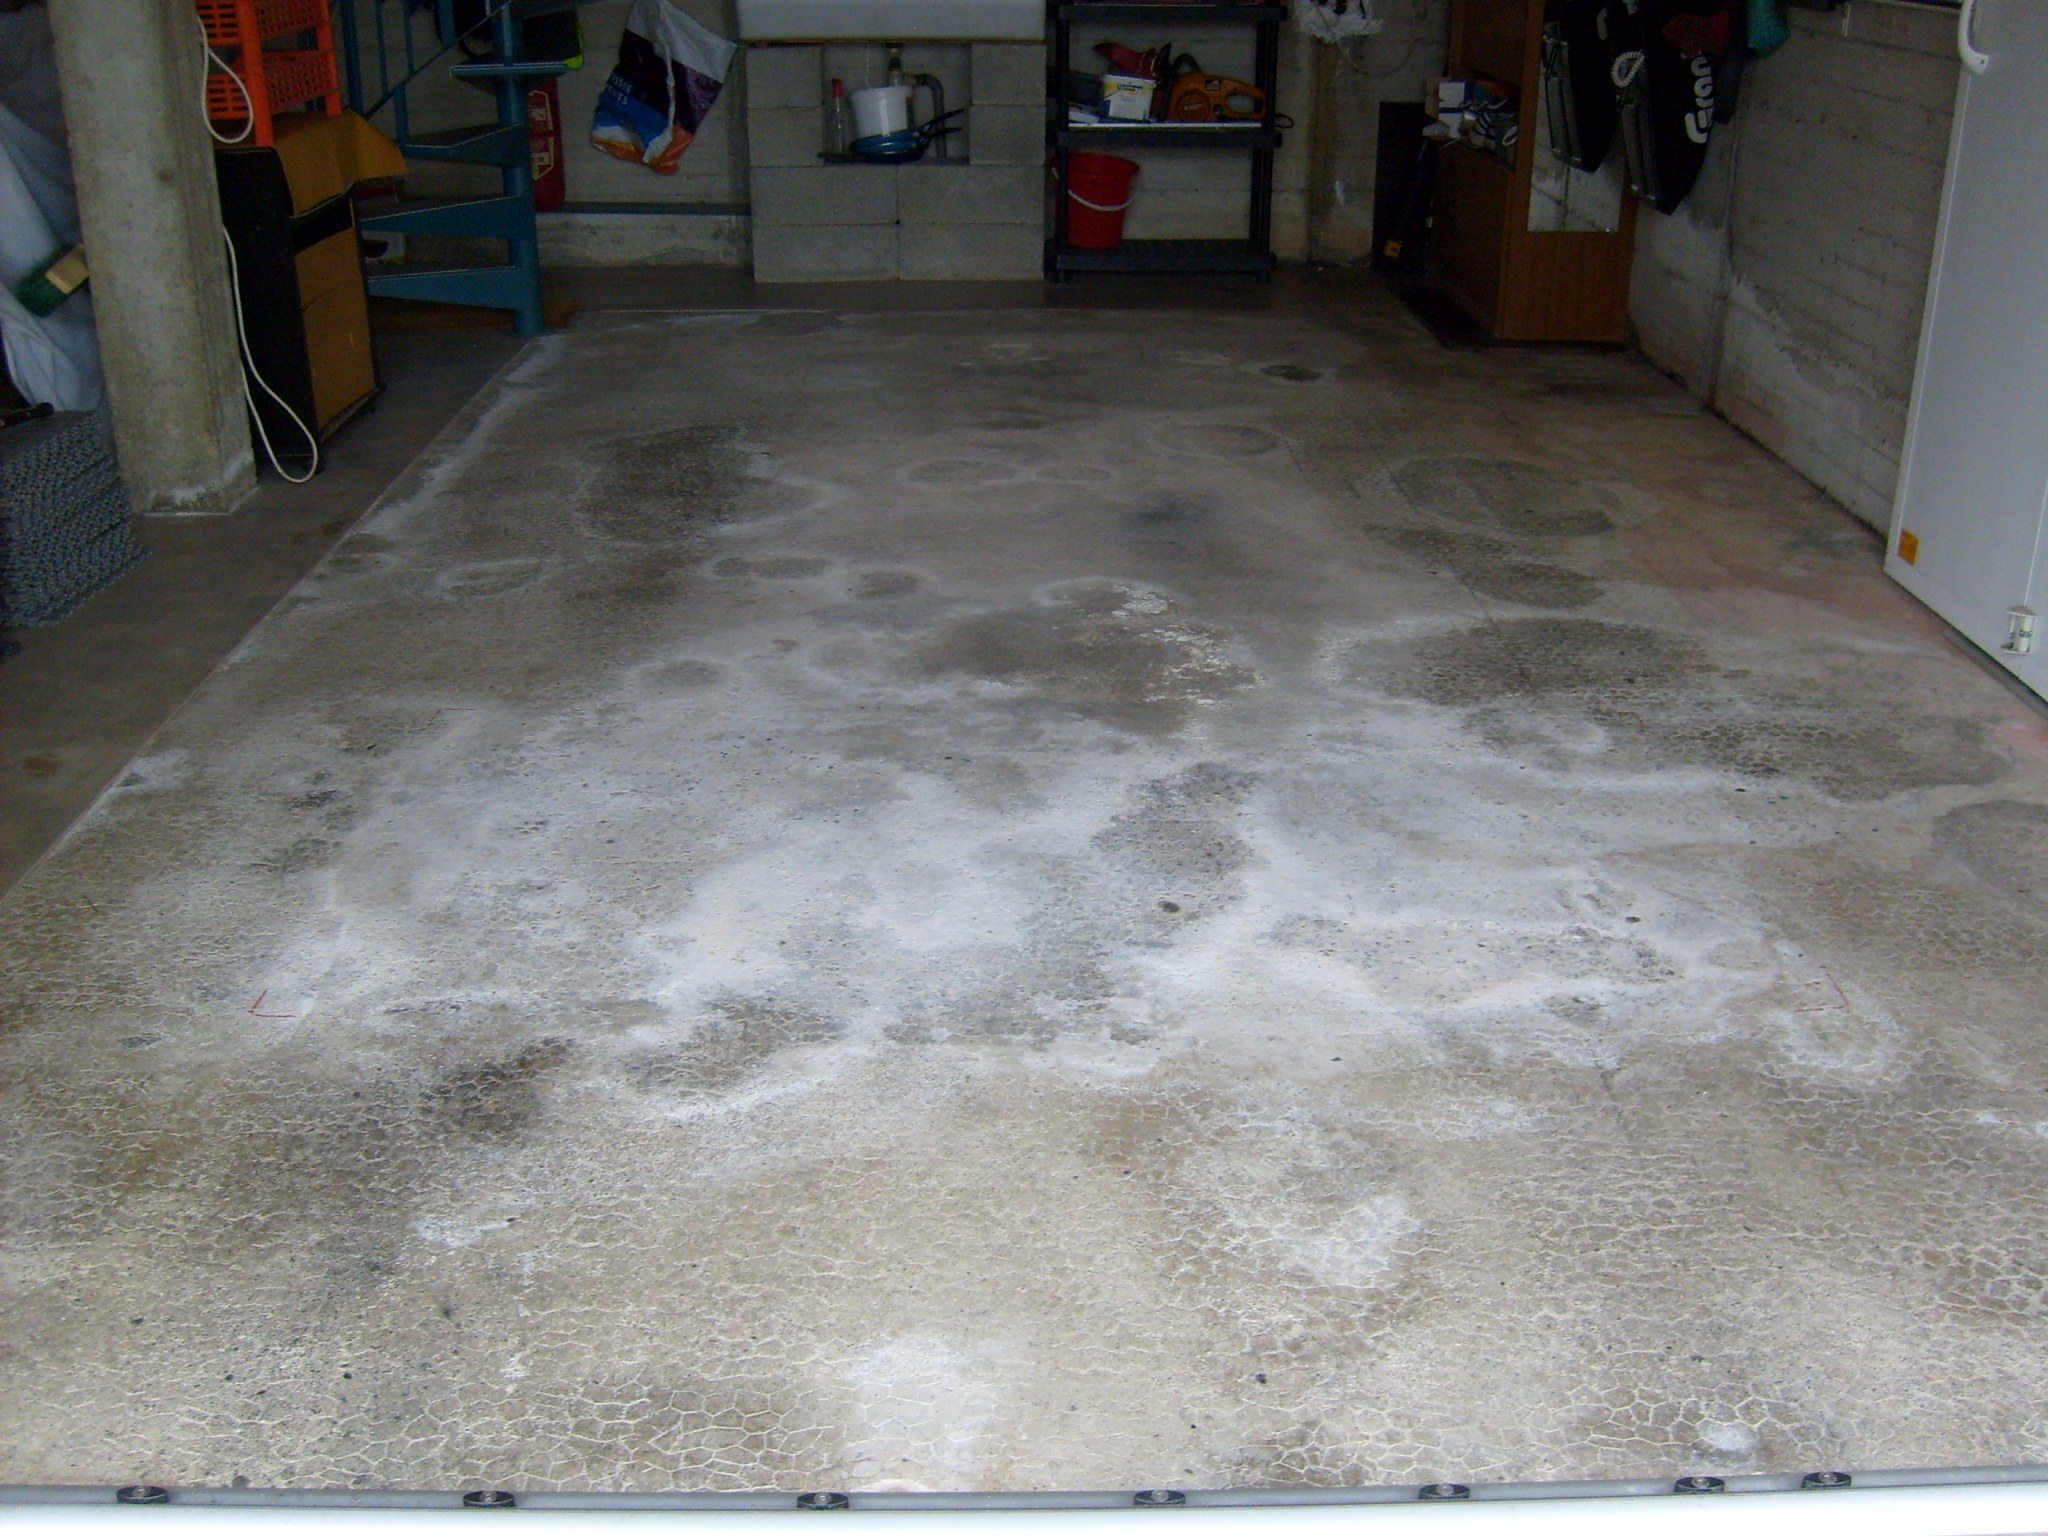 Bricoflor, flooring, home improvement, dadbloguk, dadbloguk.com